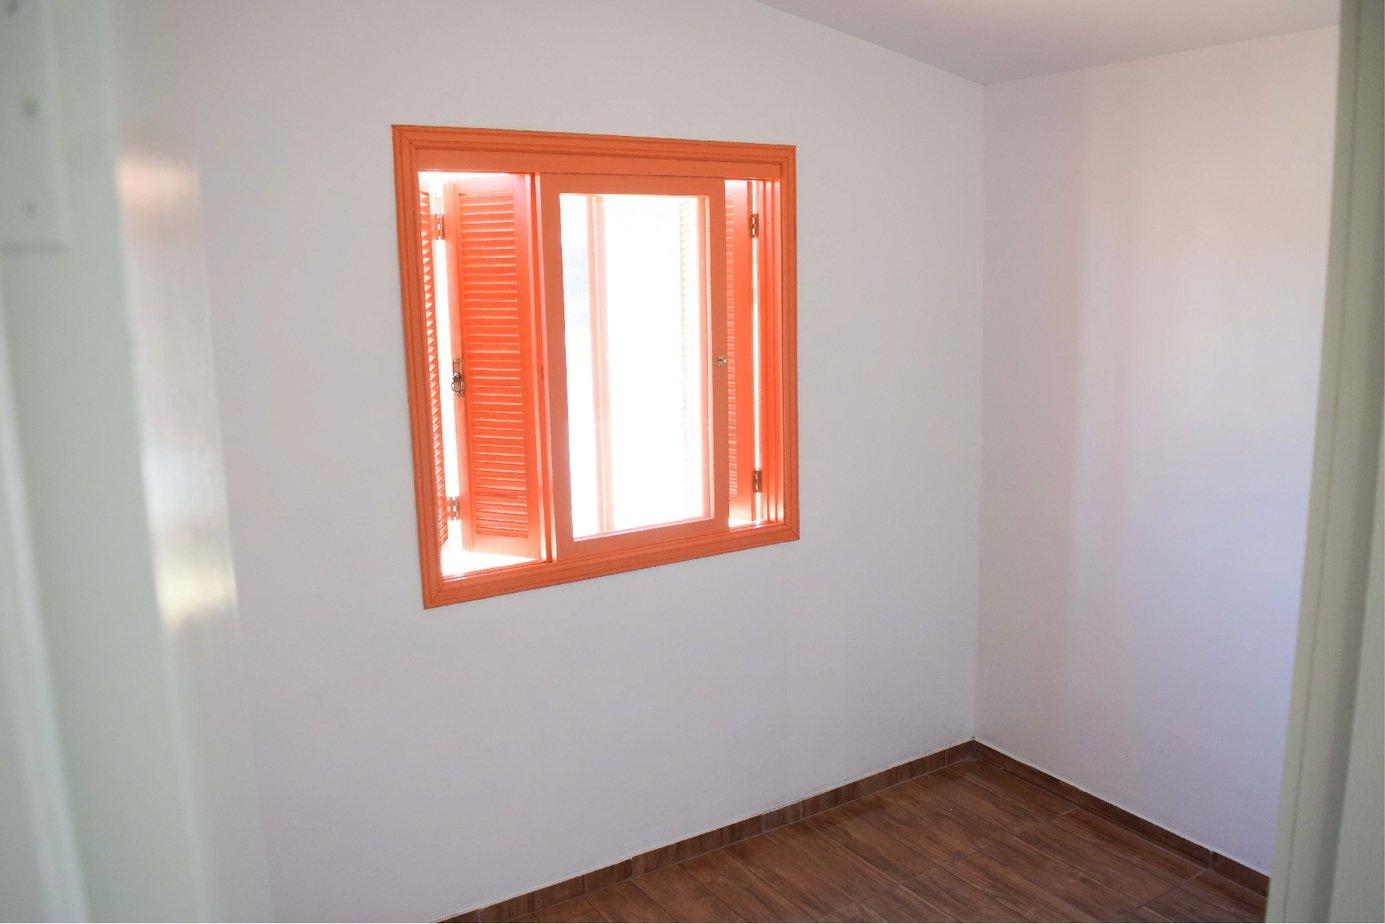 Vista interna dormitório